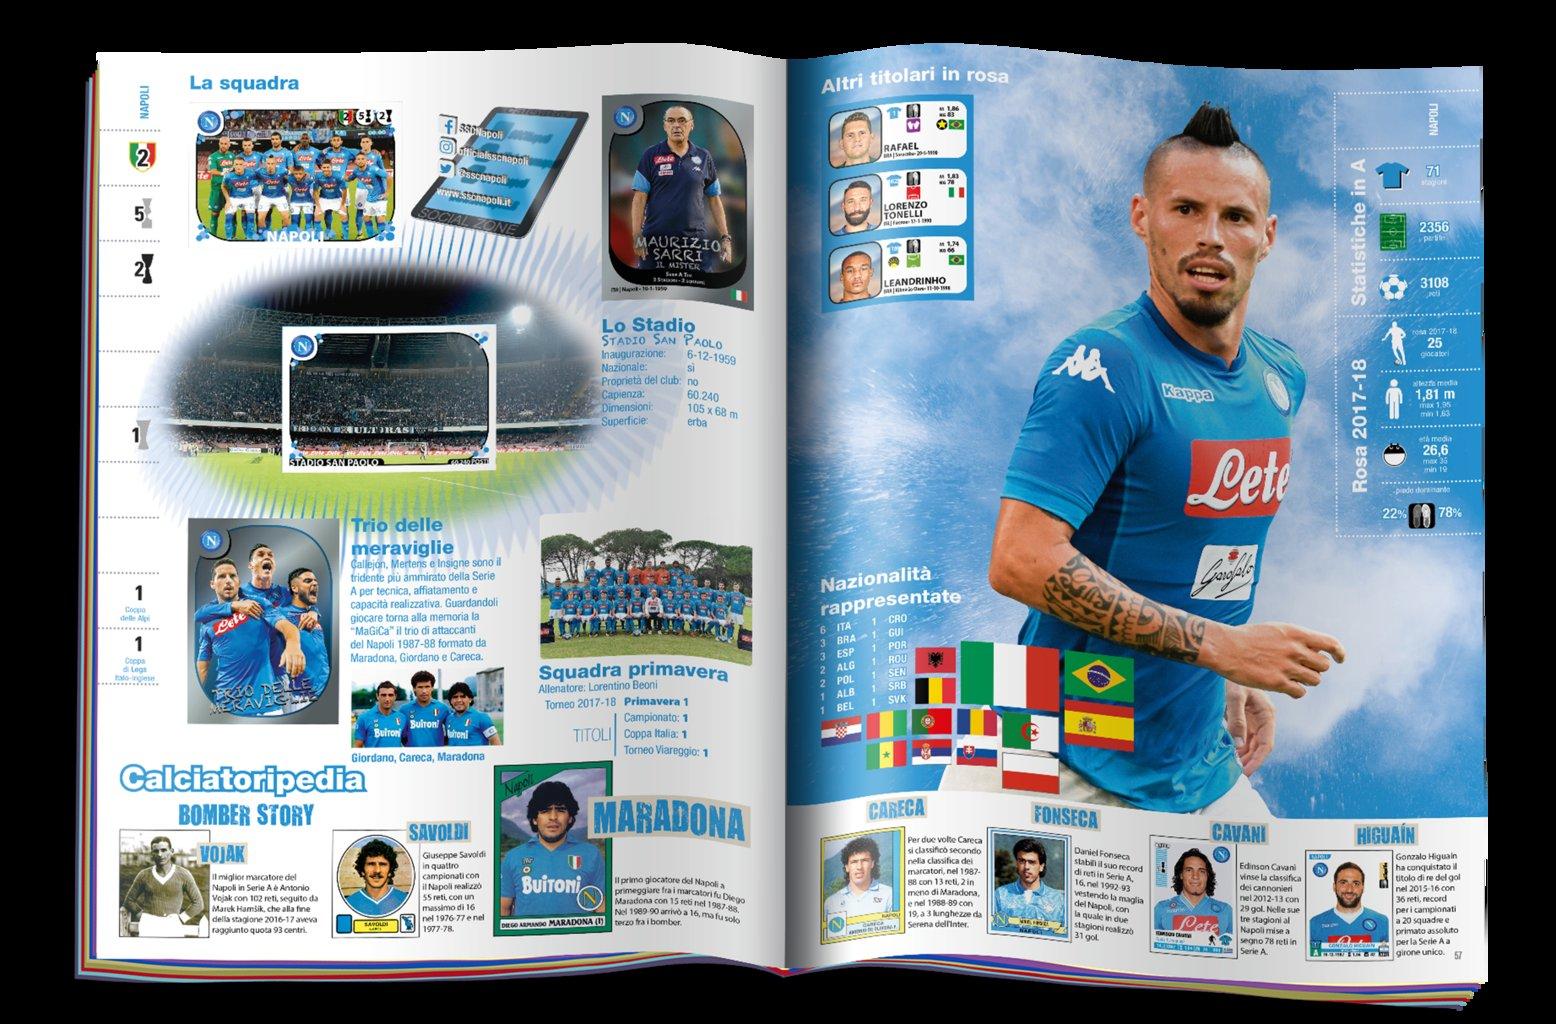 Napoli p3-4-Calciatori-Panini-2017-2018 (FILEminimizer)